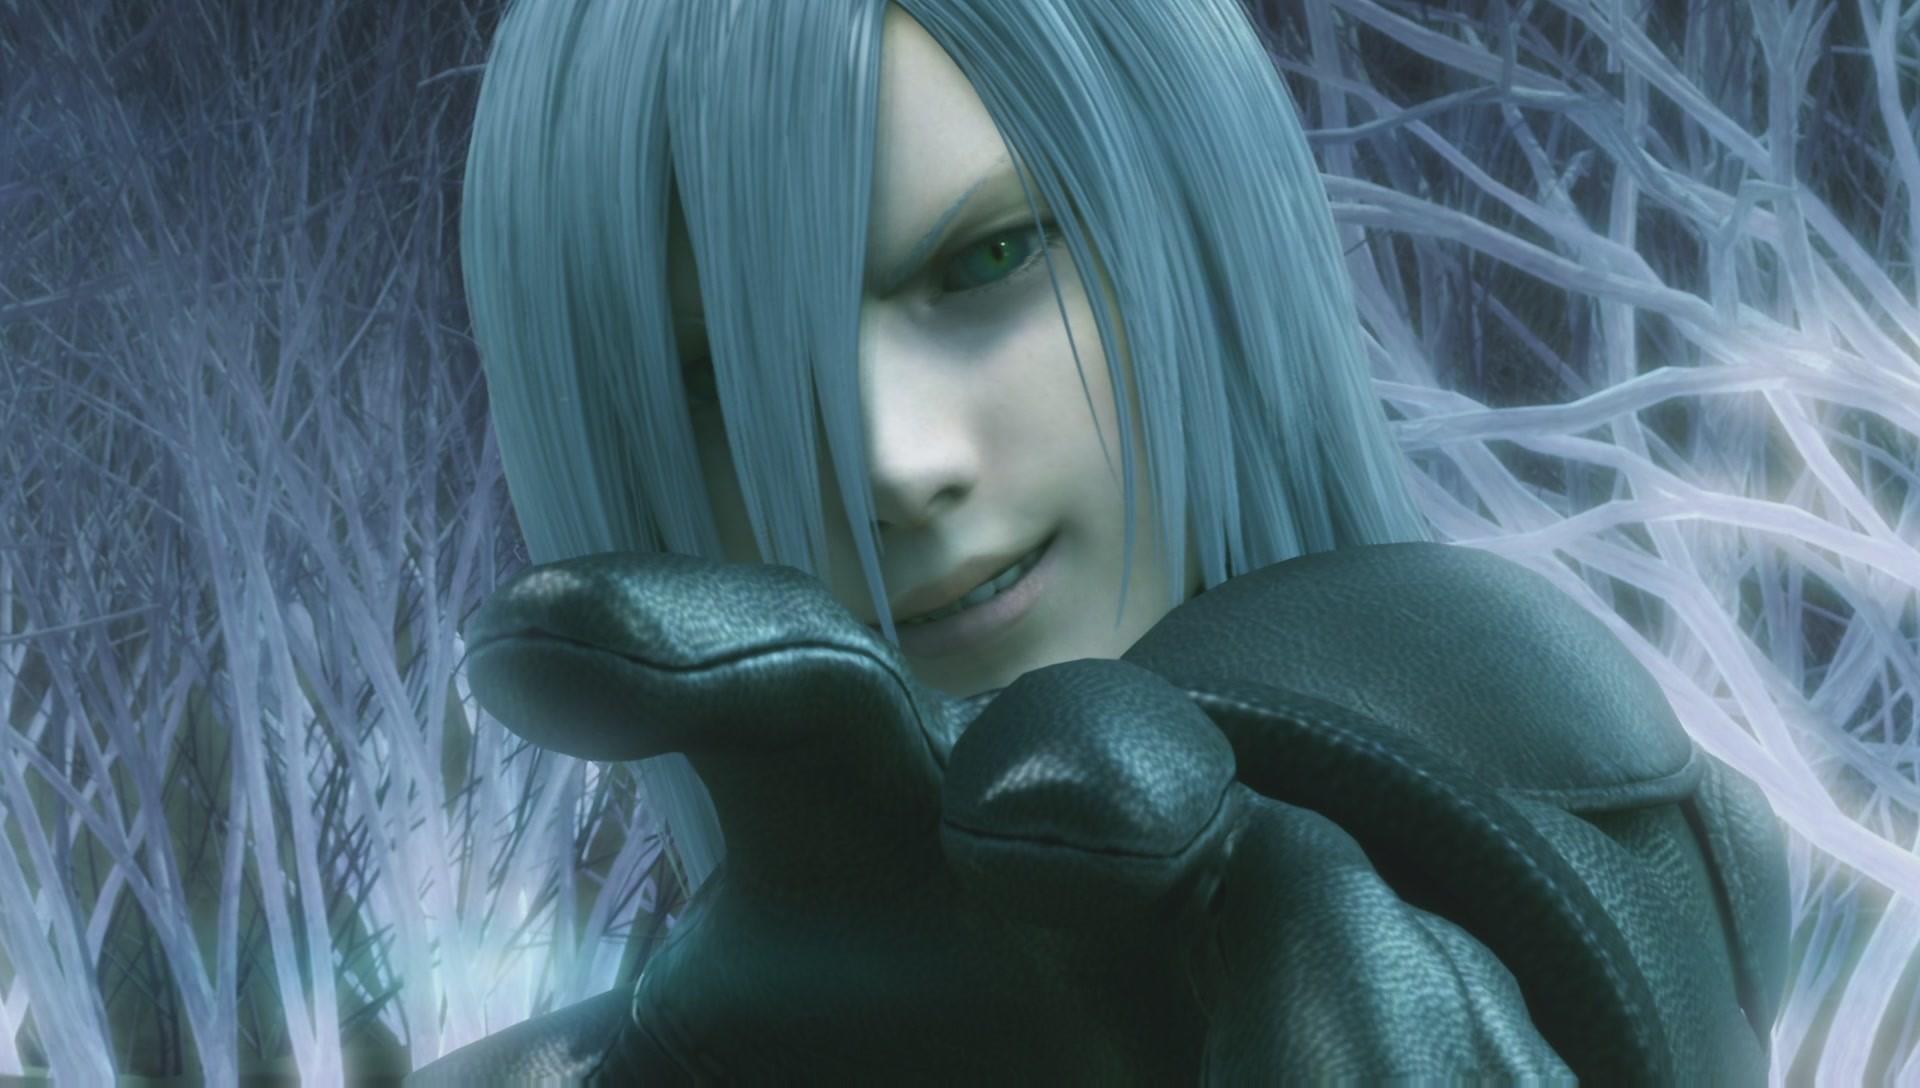 Final Fantasy Xv Wallpaper Iphone X Final Fantasy Vii Advent Children Full Hd Wallpaper And